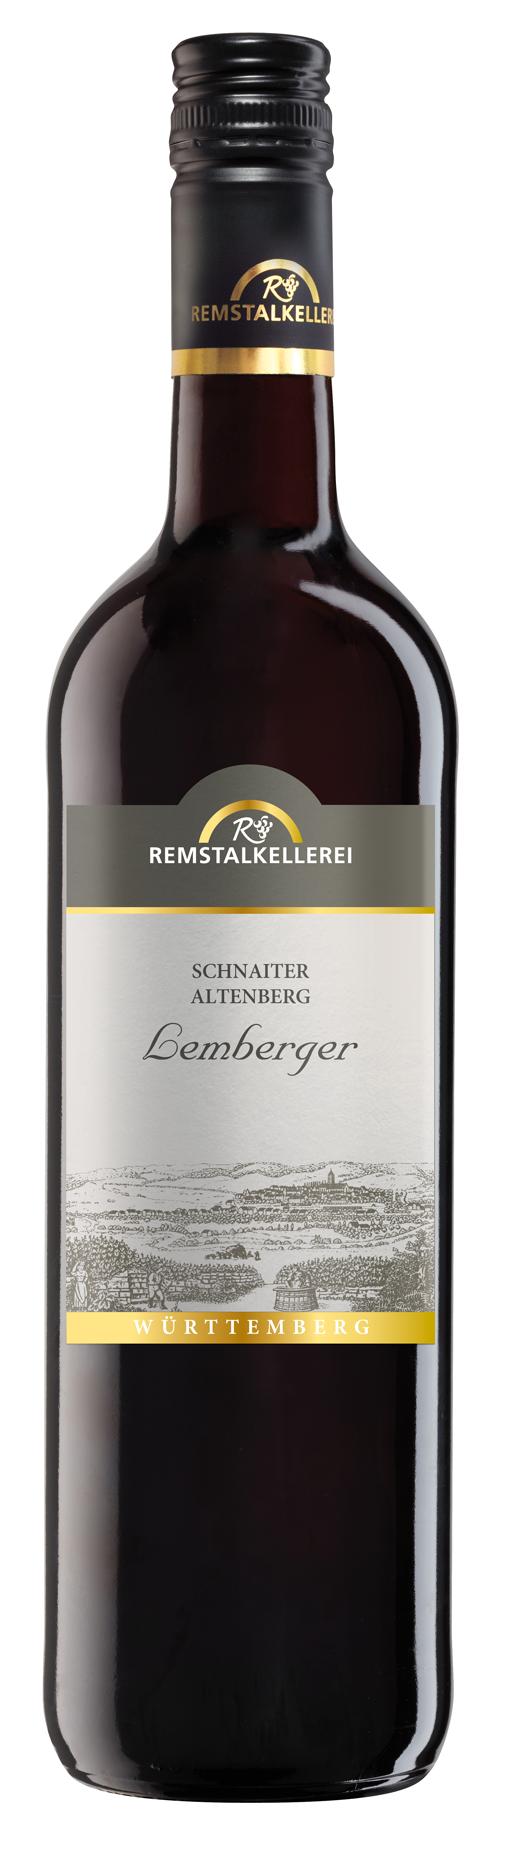 Schnaiter Altenberg Lemberger